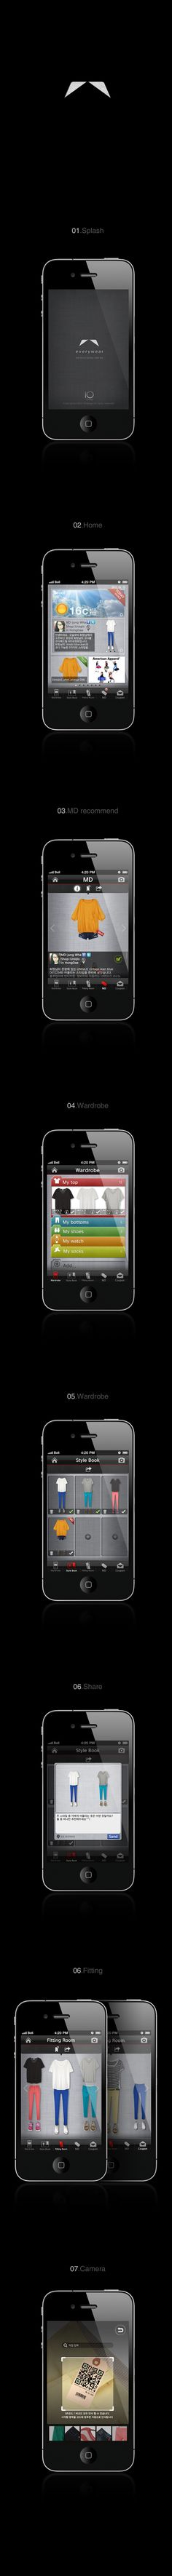 iOS Application everywear by kwang kuk Kim, via Behance